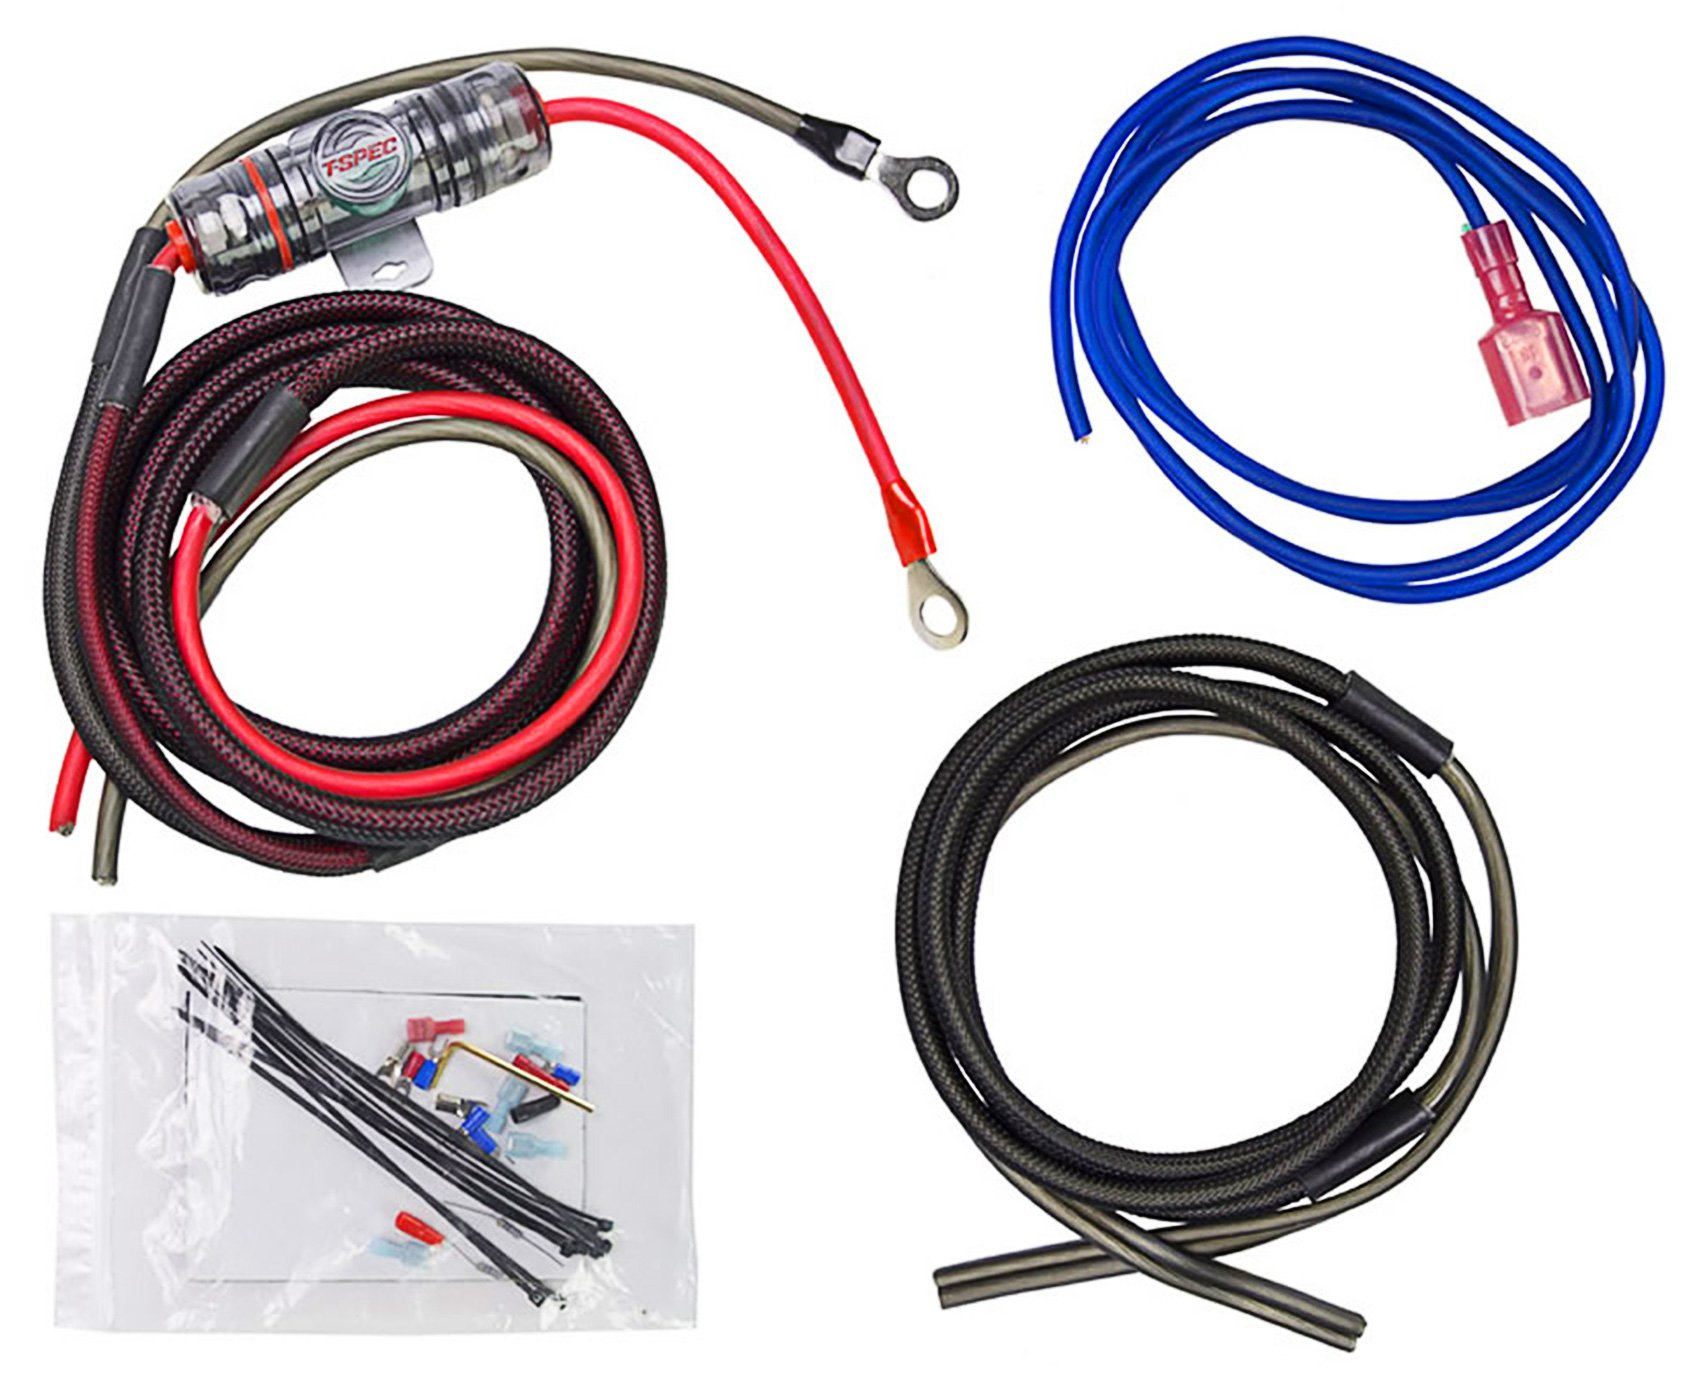 Metra ST-AK8 Motorcycle/ATV/UTV/RZR 8 Gauge OFC Amplifier Amp Install Wire Kit by Metra (Image #1)